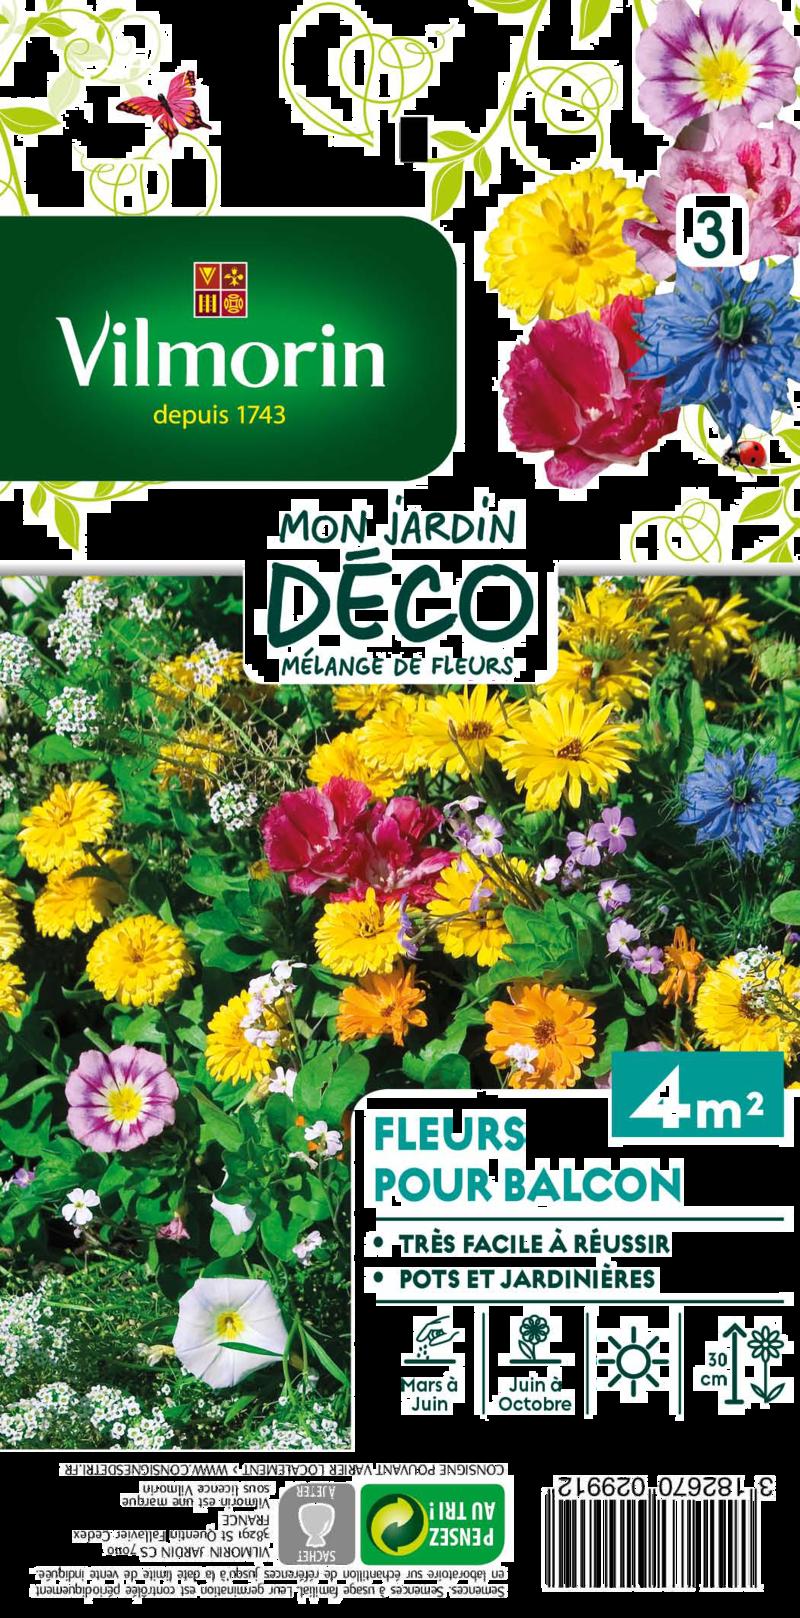 melange fleurs pour balcon mon jardin deco vilmorin graine semence melange massif - Voir en grand